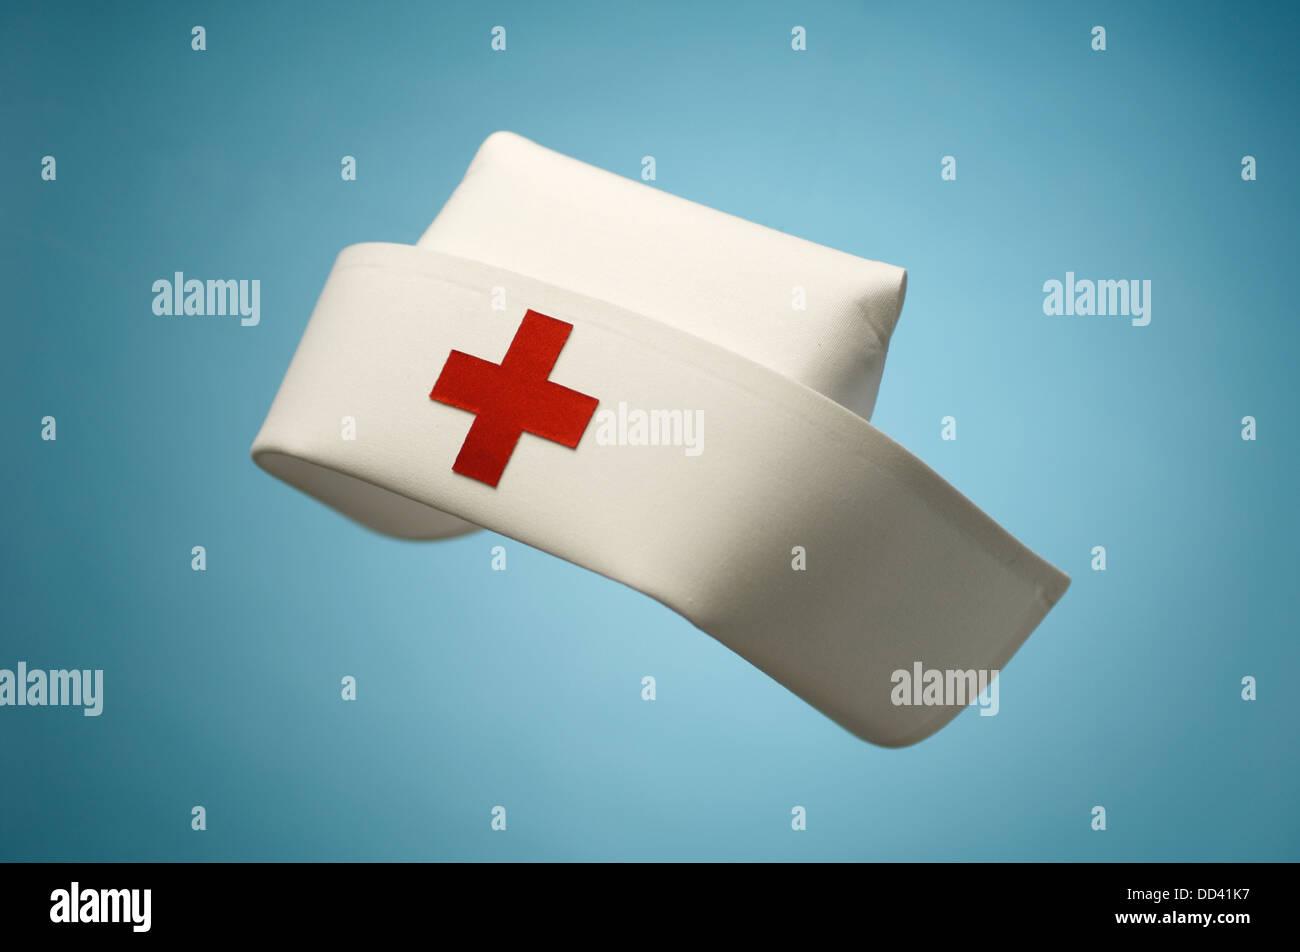 A hospital nurse hat floating on a blue background. - Stock Image